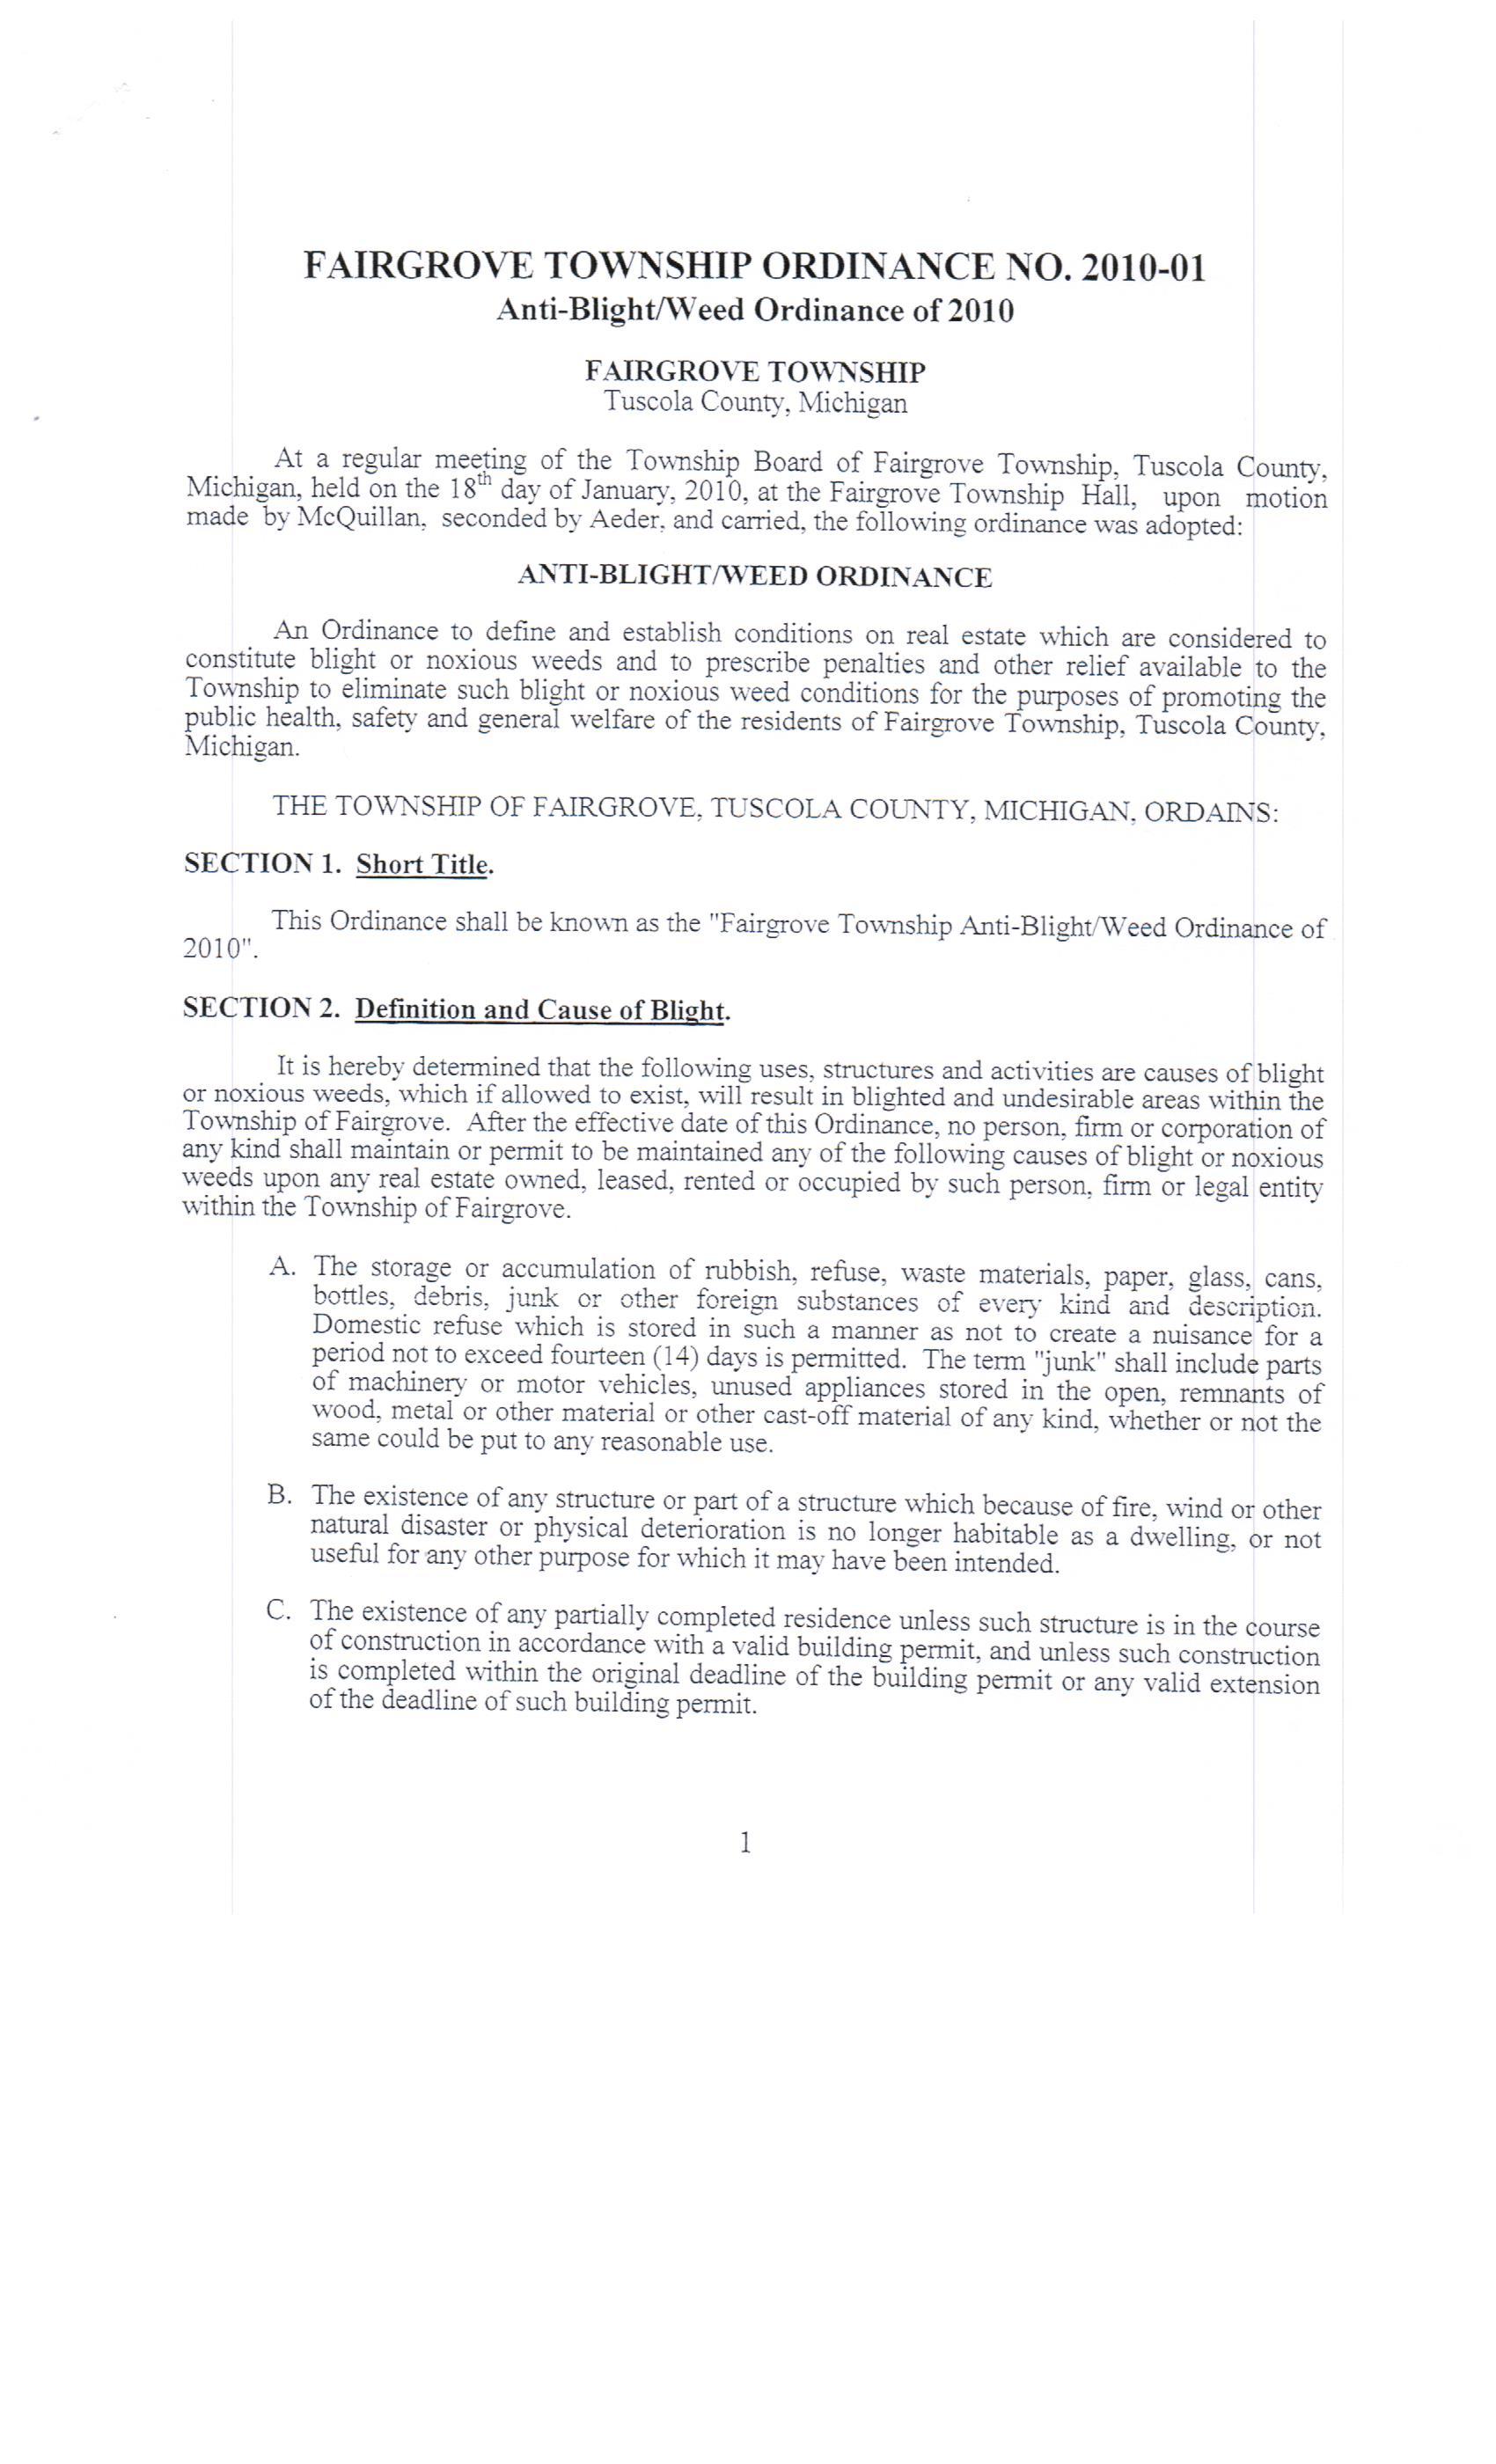 Documents | Fairgrove Township